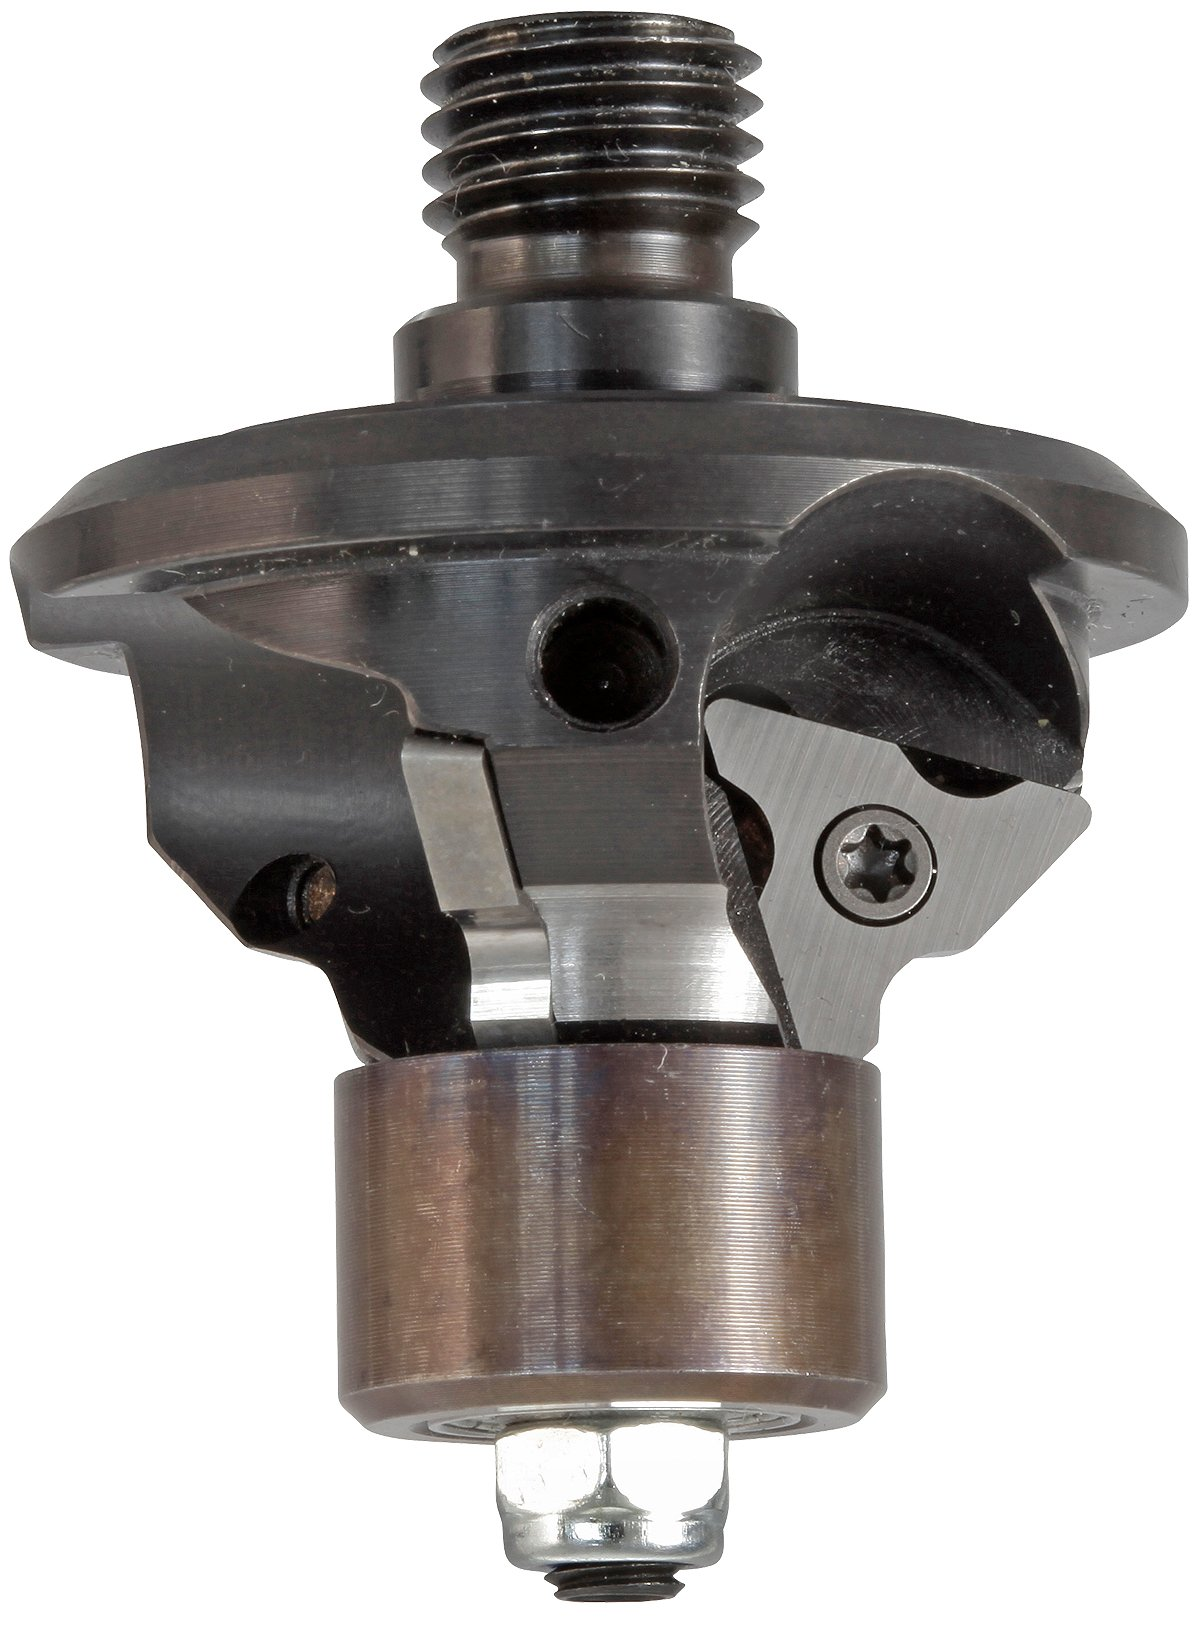 CS Unitec ZFR 452.3 2.5 mm Milling Head for The EKF 452.3